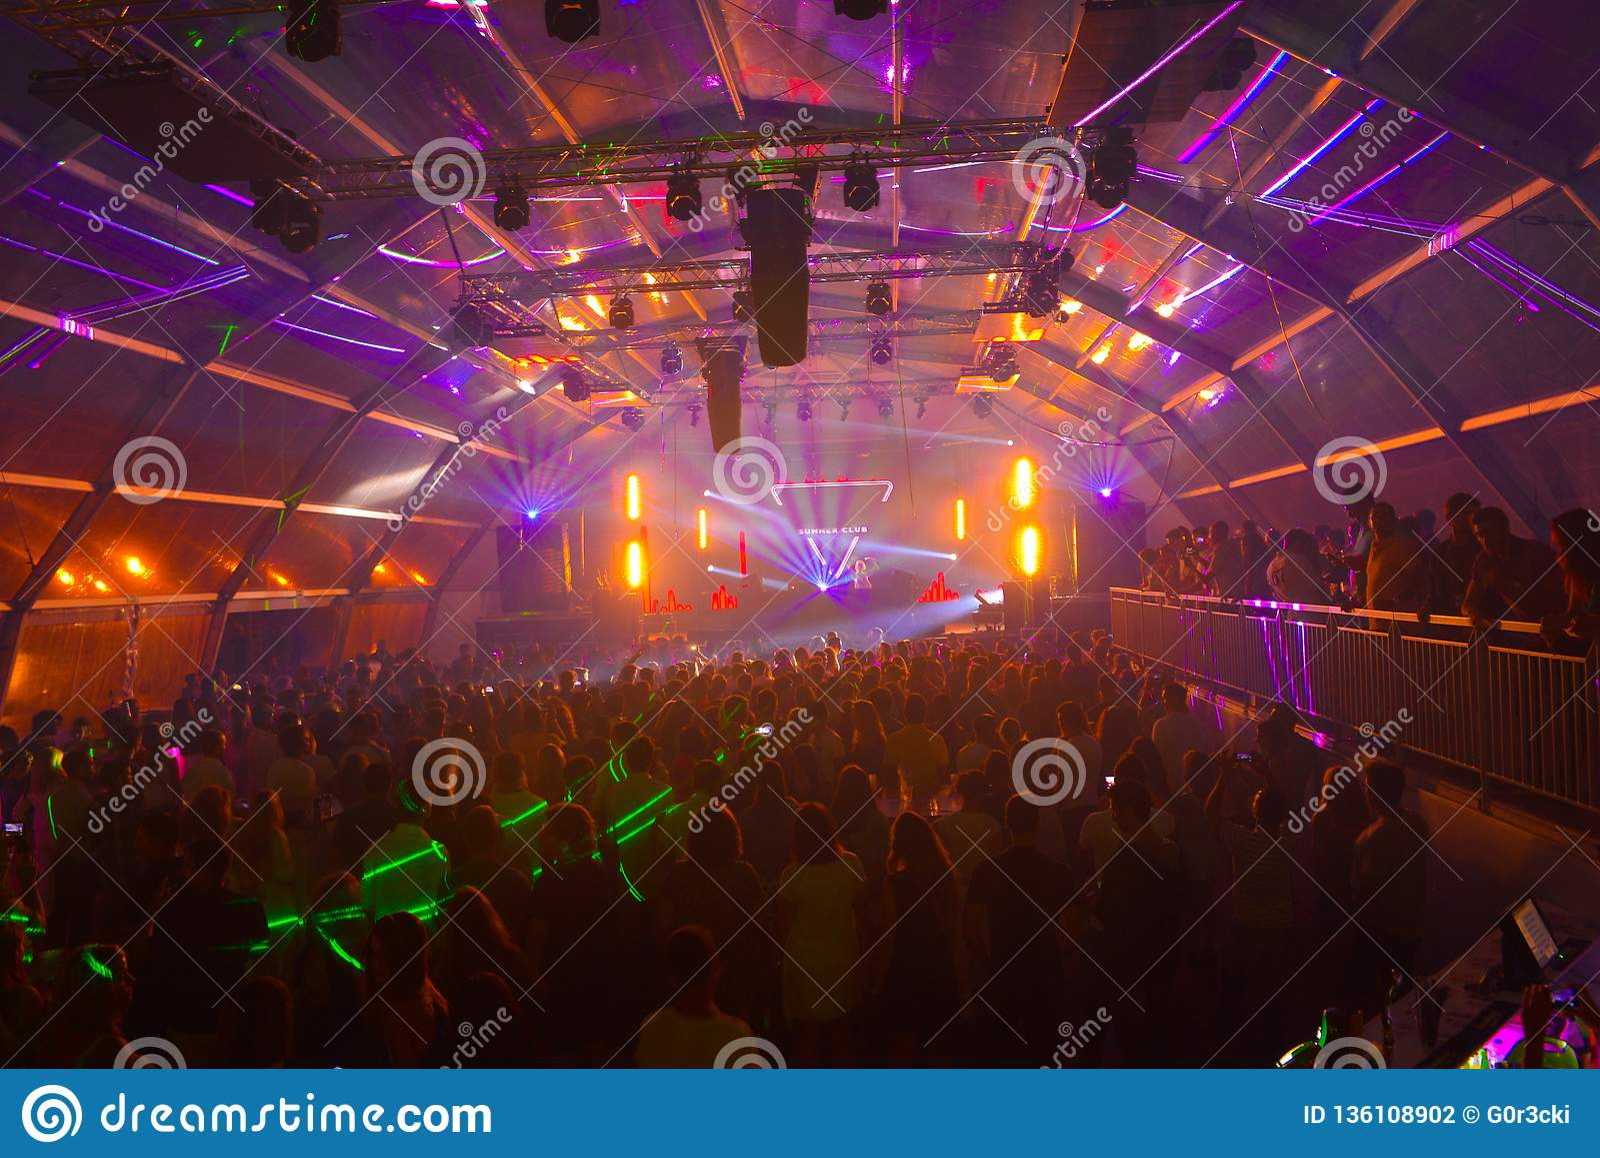 Rave Music, Summer Night Club, Colorful Lazer Lights